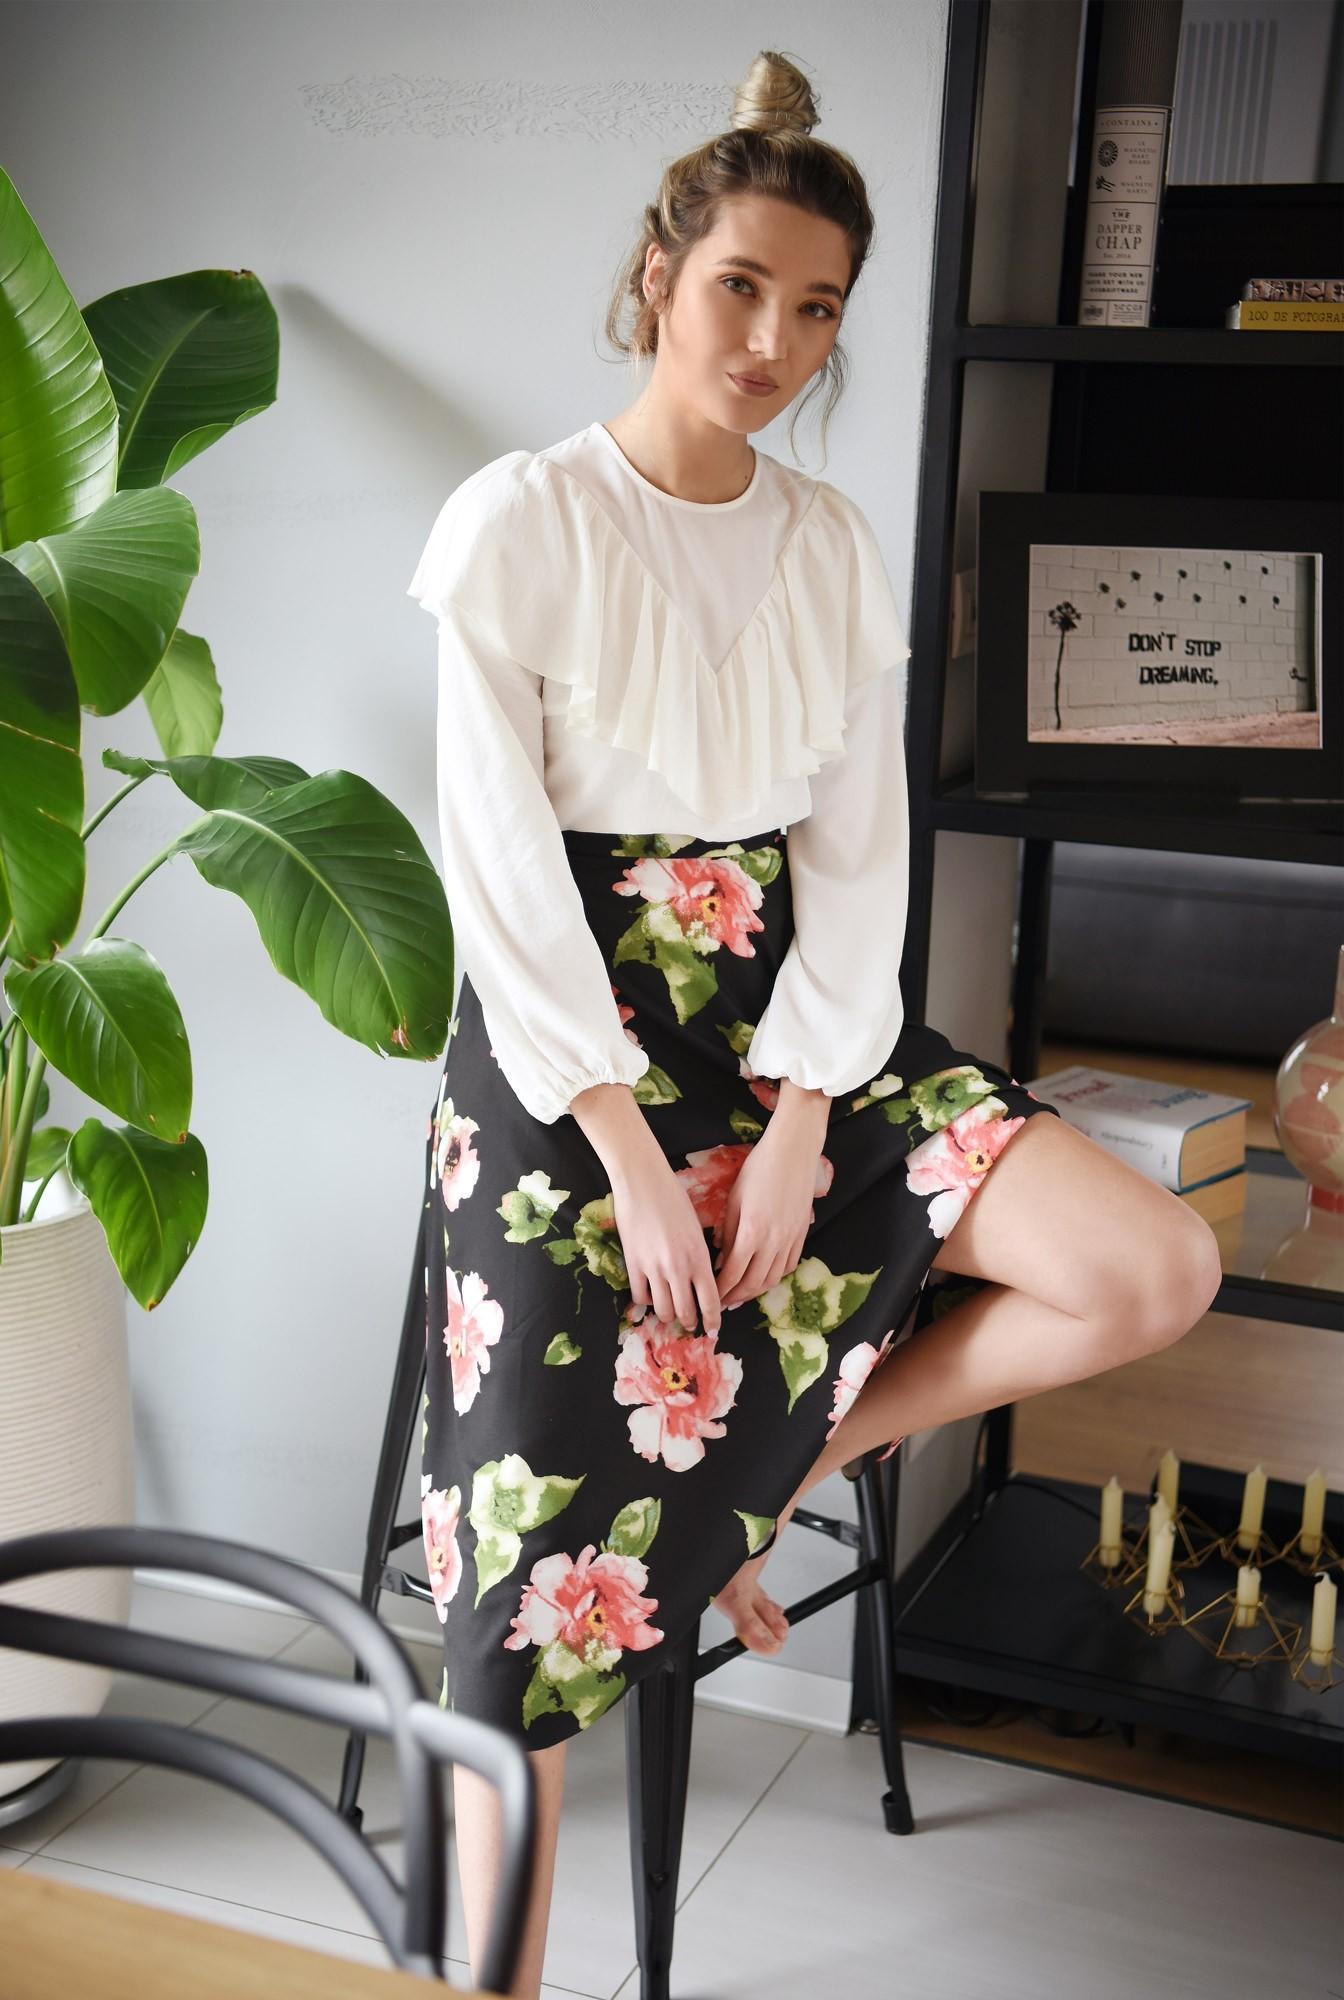 0 - fusta casual, cu flori, midi, talie inalta, fusta de primavara